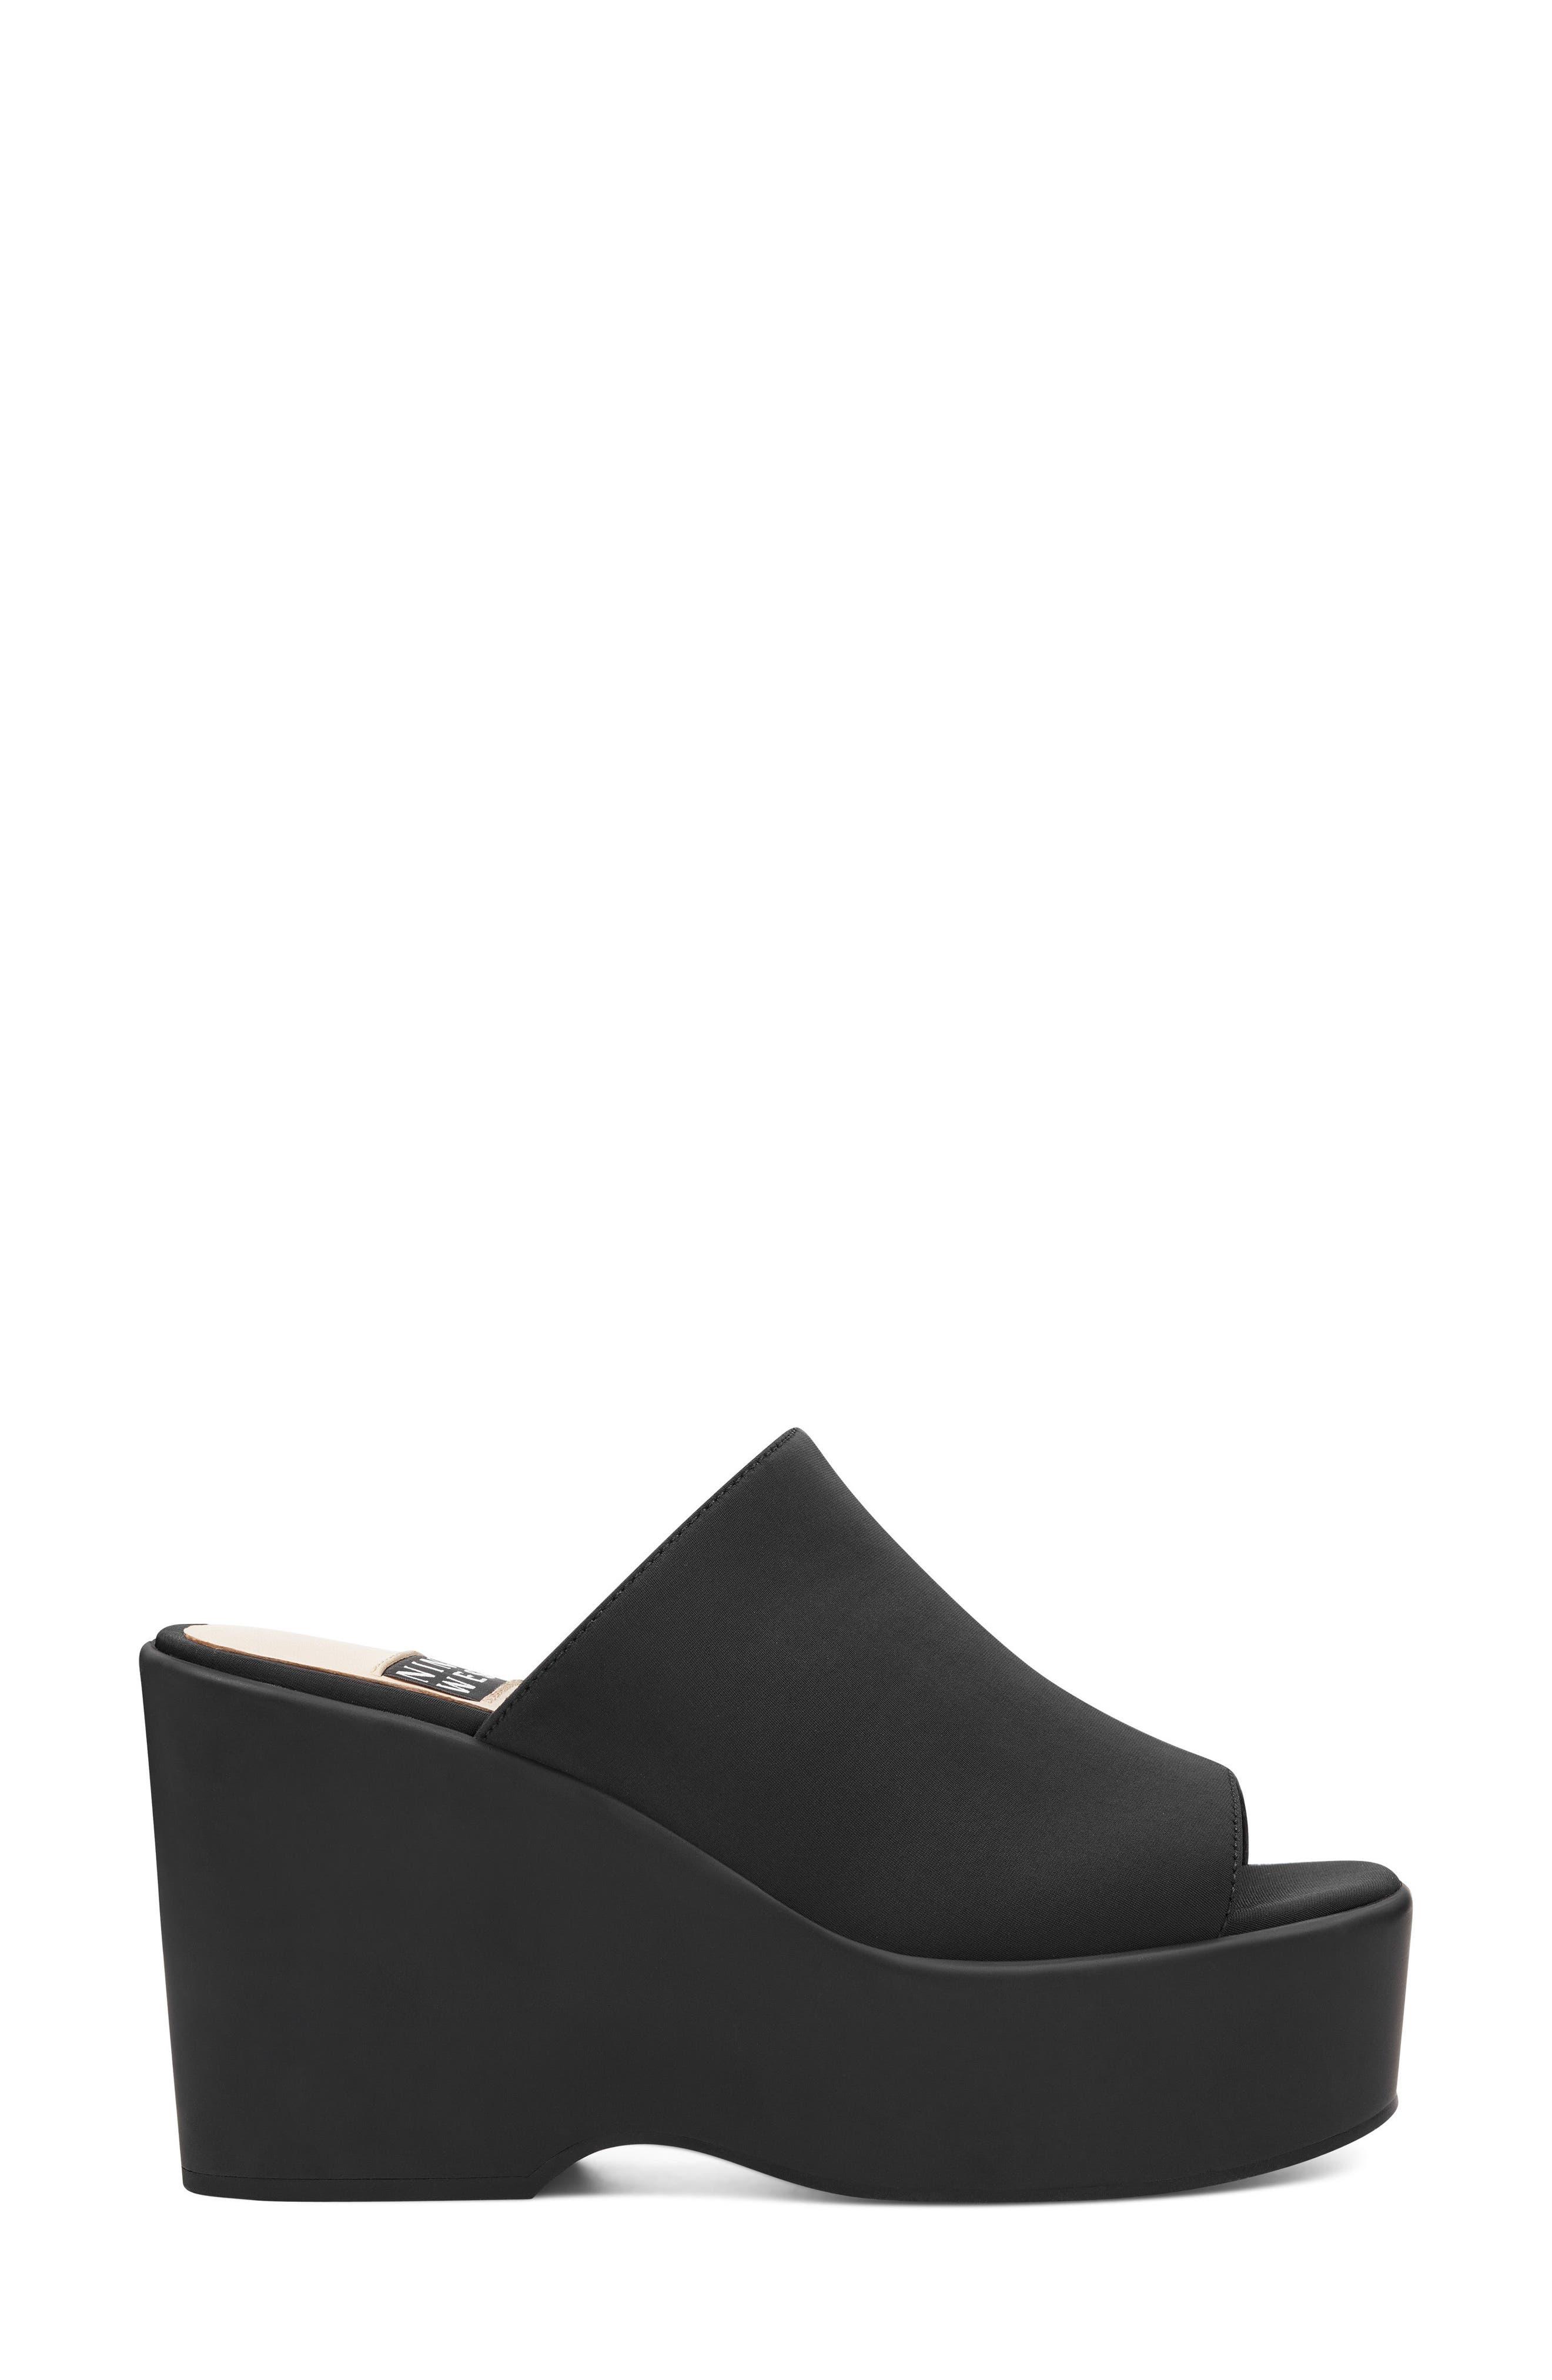 Tomo - 40th Anniversary Capsule Collection Platform Sandal,                             Alternate thumbnail 3, color,                             BLACK FABRIC